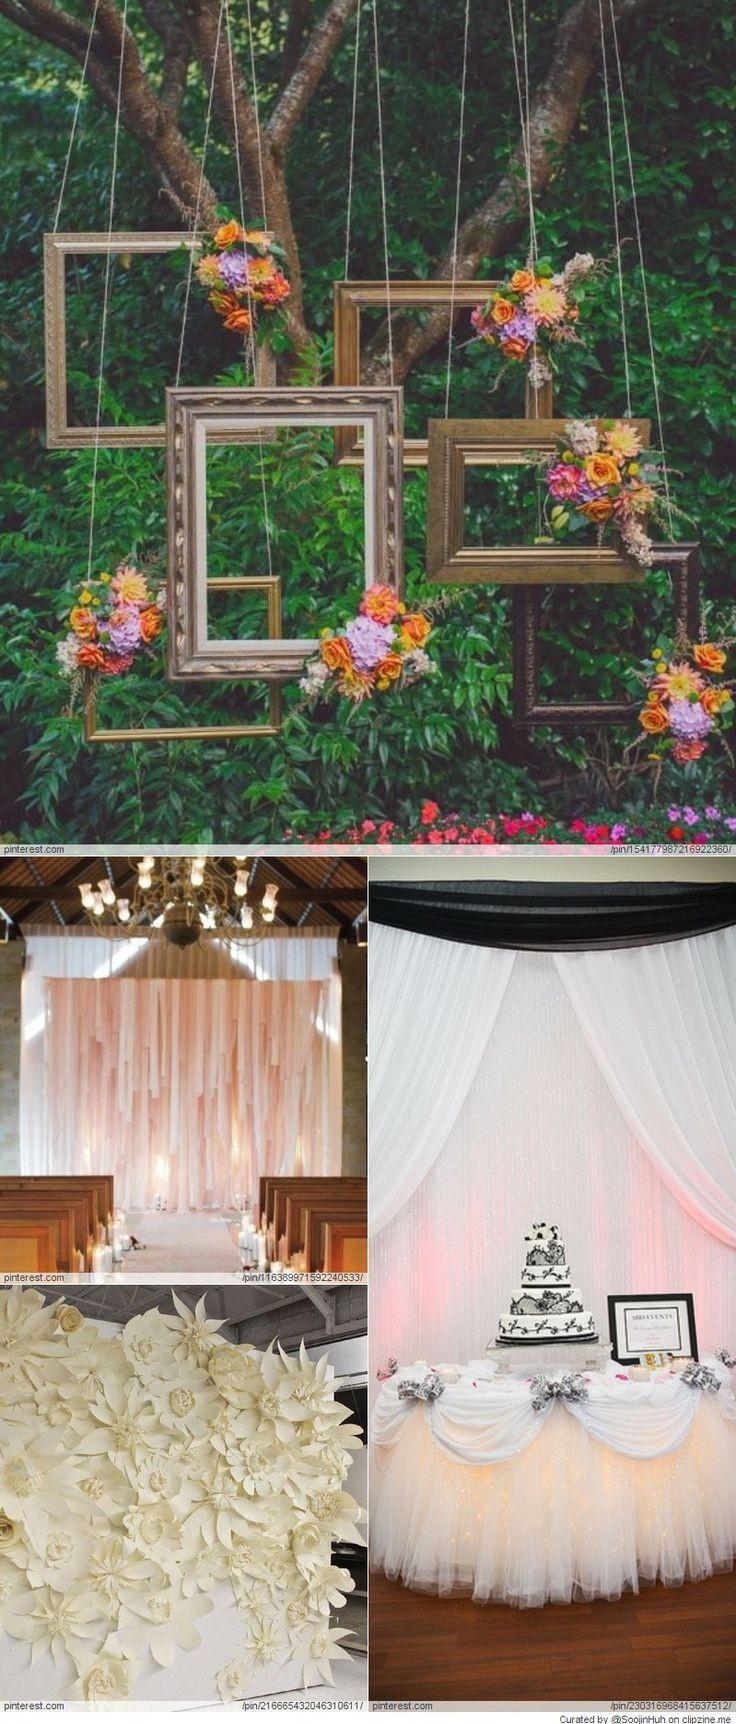 Best ideas about Wedding Backdrop Ideas DIY . Save or Pin Wedding Backdrop DIY Ideas photography Now.